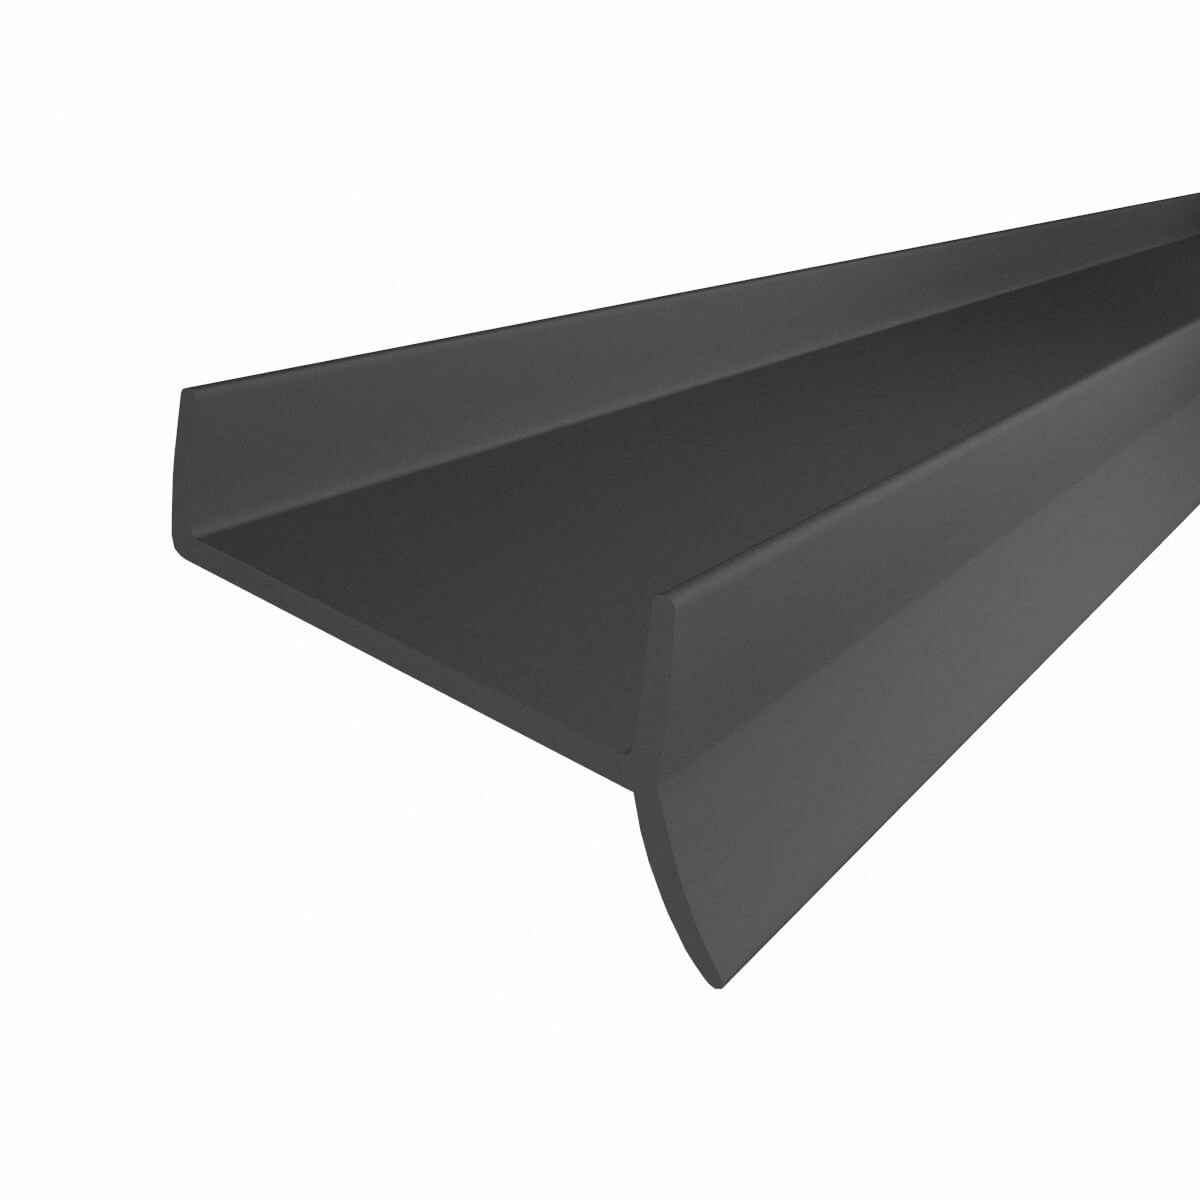 1 5m k chensockel abdichtungsprofil sockel dichtung erneuern dichtprofil boden ebay. Black Bedroom Furniture Sets. Home Design Ideas